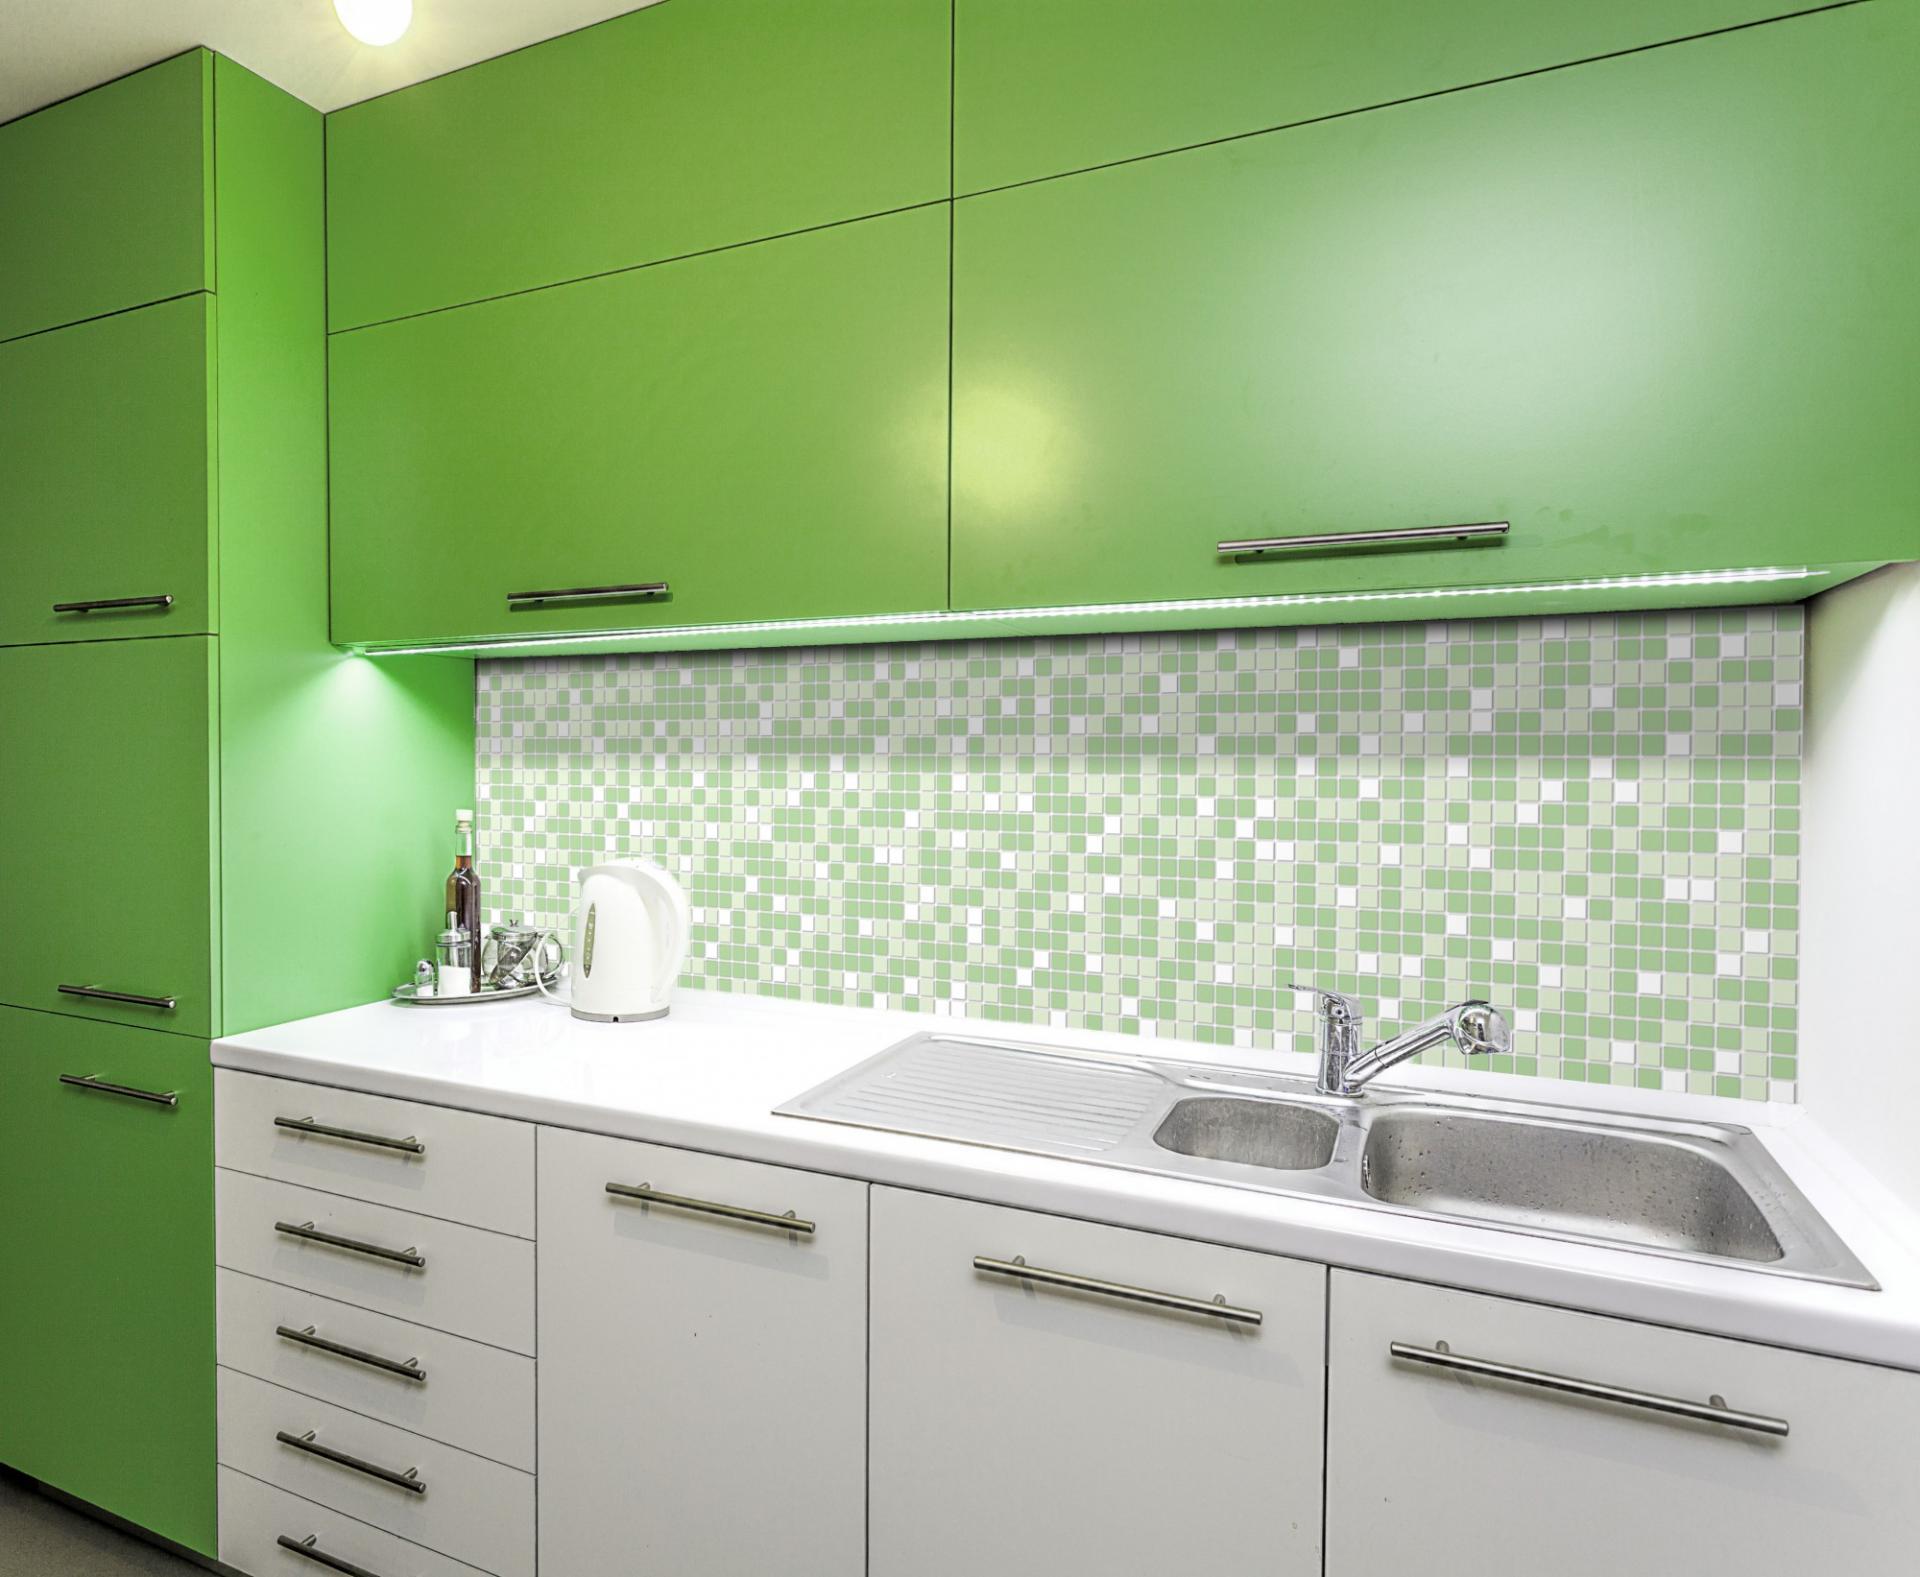 Mosaic green 3